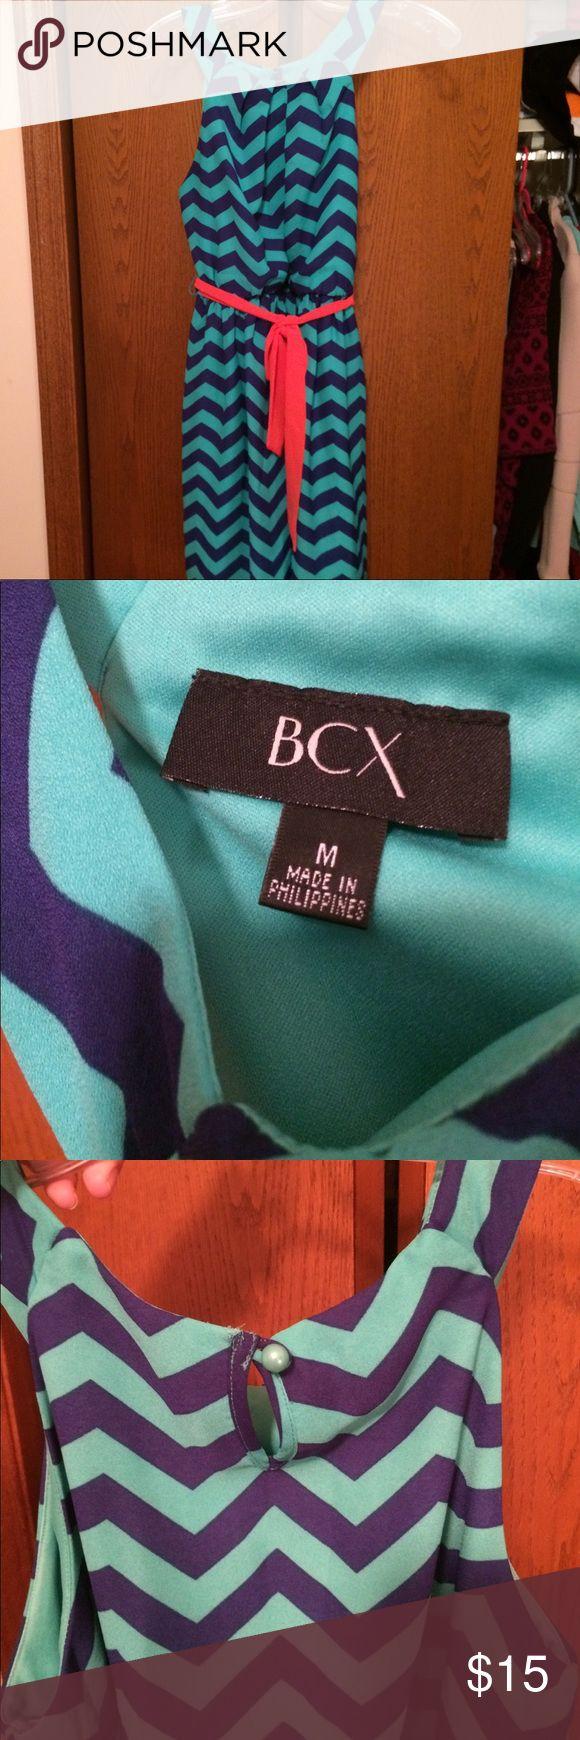 Chevron dress Teal and blue chevron dress with peach tie around cinched waist. BCX Dresses Mini